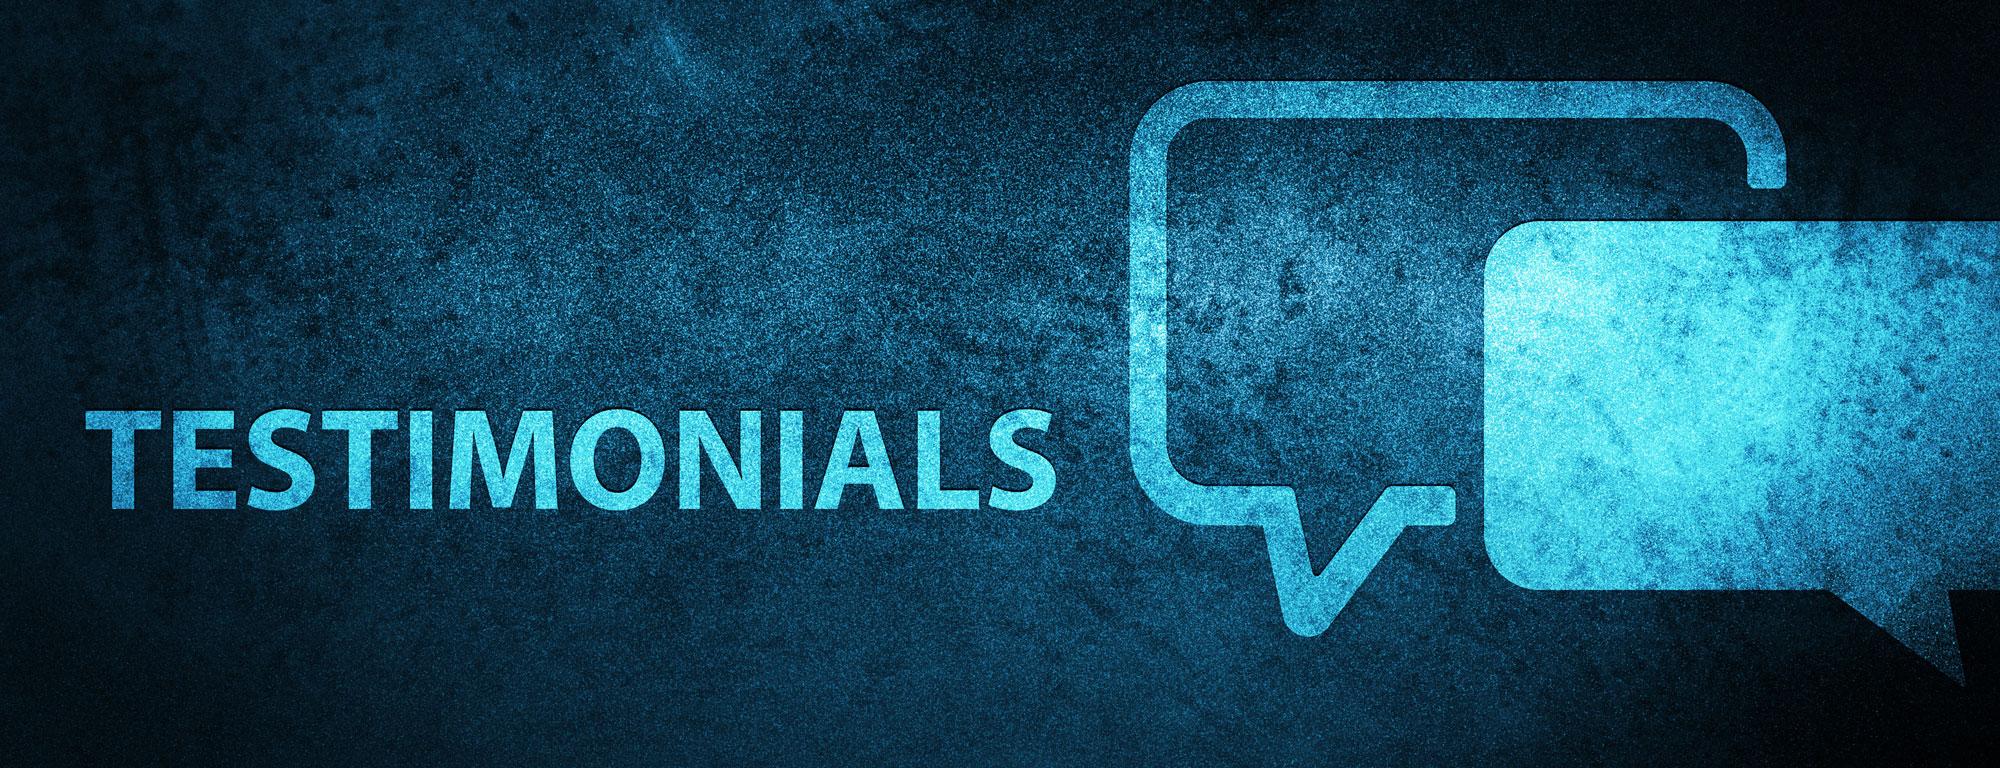 Indianapolis Plastic Surgeons | Dr. Stephen Perkins, MD Testimonials